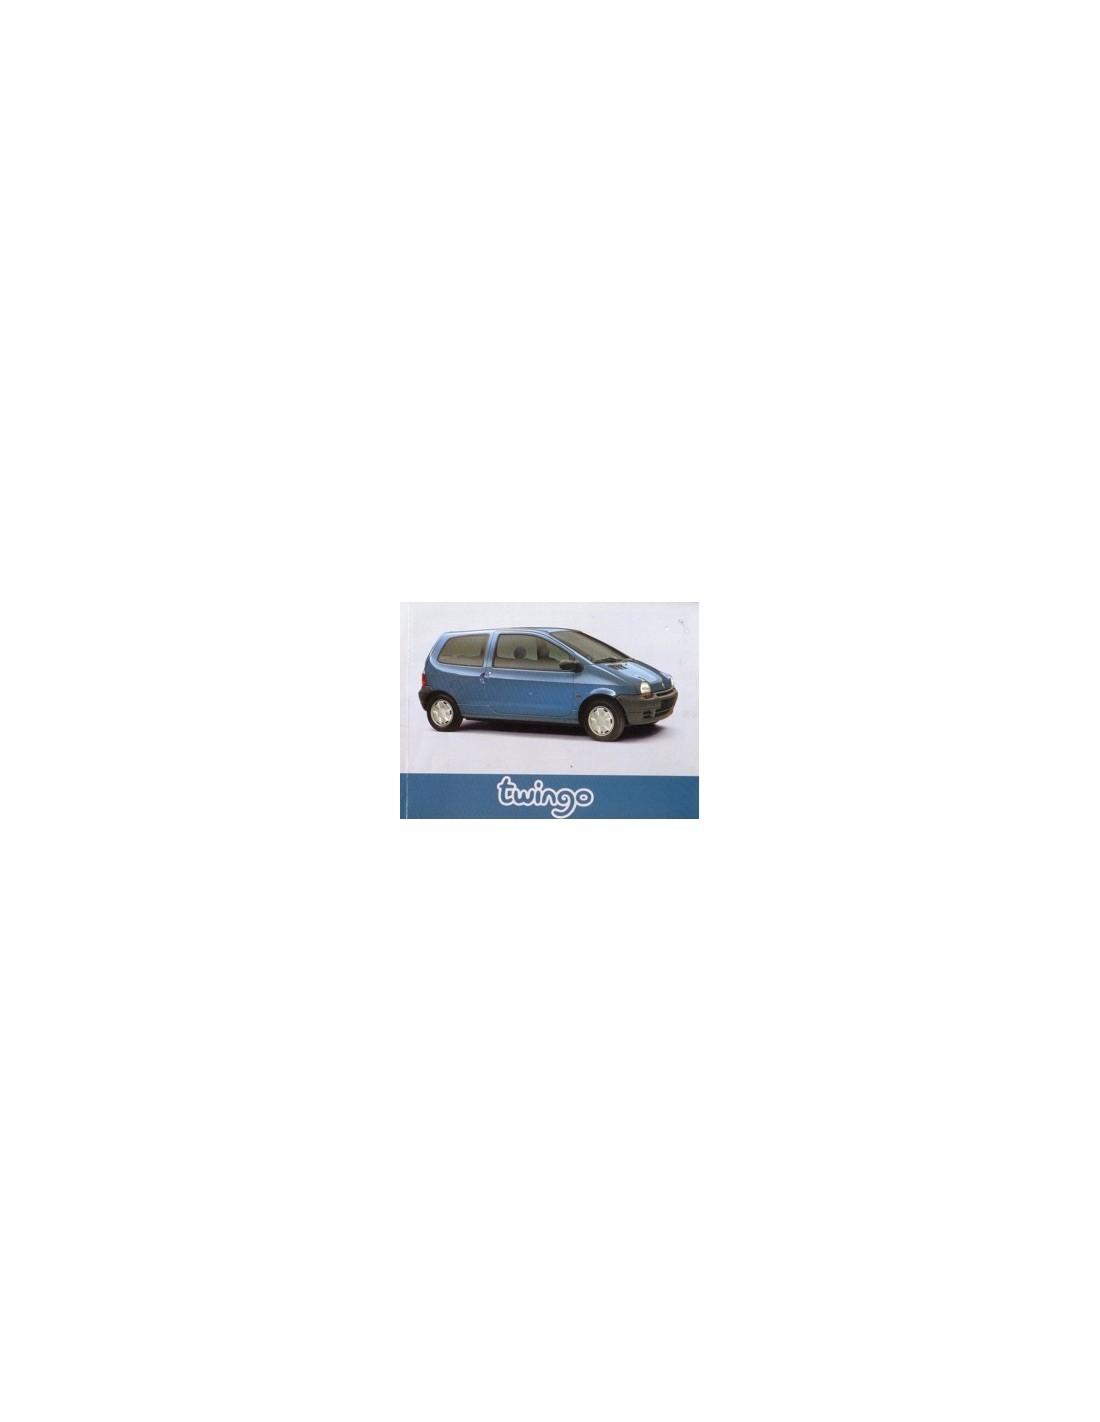 1996 renault twingo owners manual handbook french rh autolit eu Renault DeZir Renault DeZir